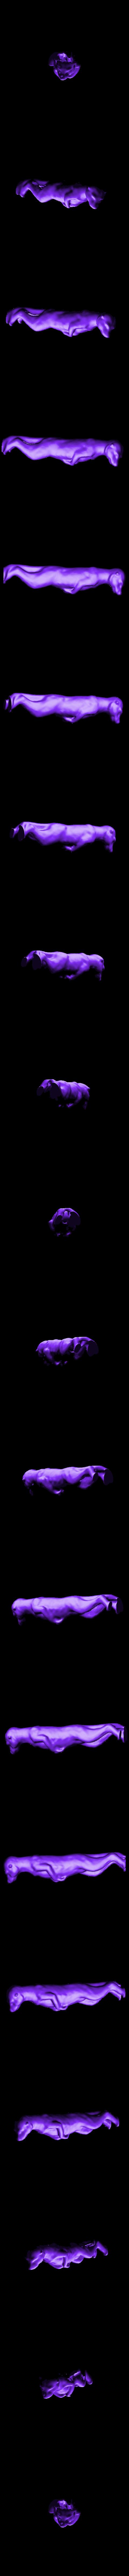 suricat1.stl Download free STL file Garden figure of a surakat (probably) • 3D printable design, AVIZO